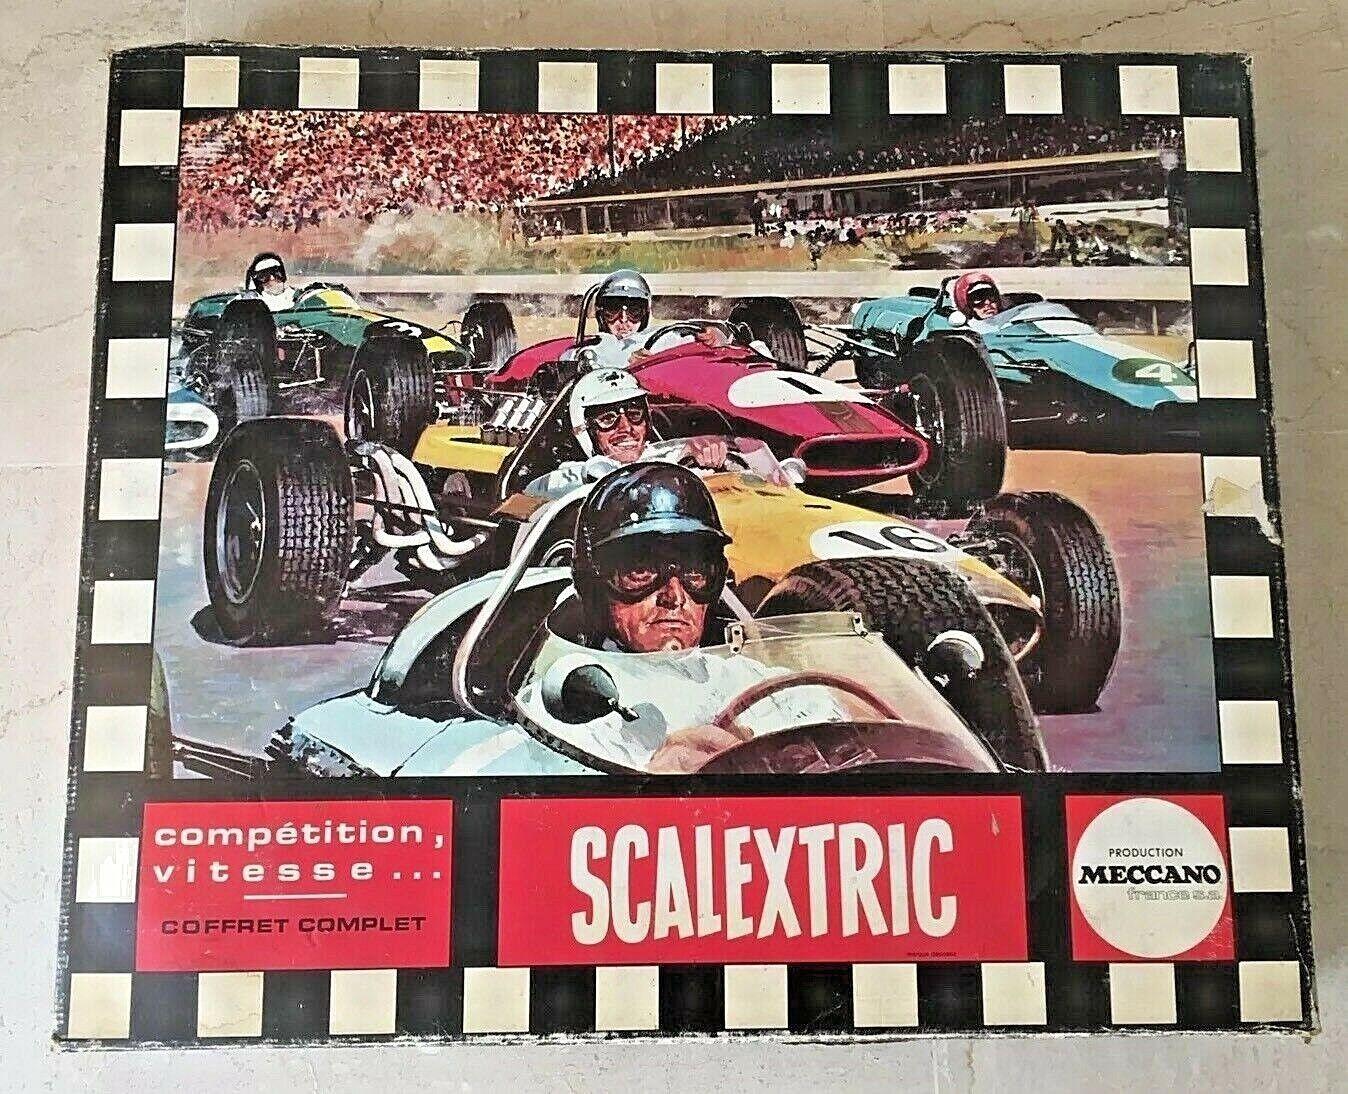 Circuit de voitures Scalextric Meccano - Ferrari & Tyrell - 38LT -  Vintage 1970